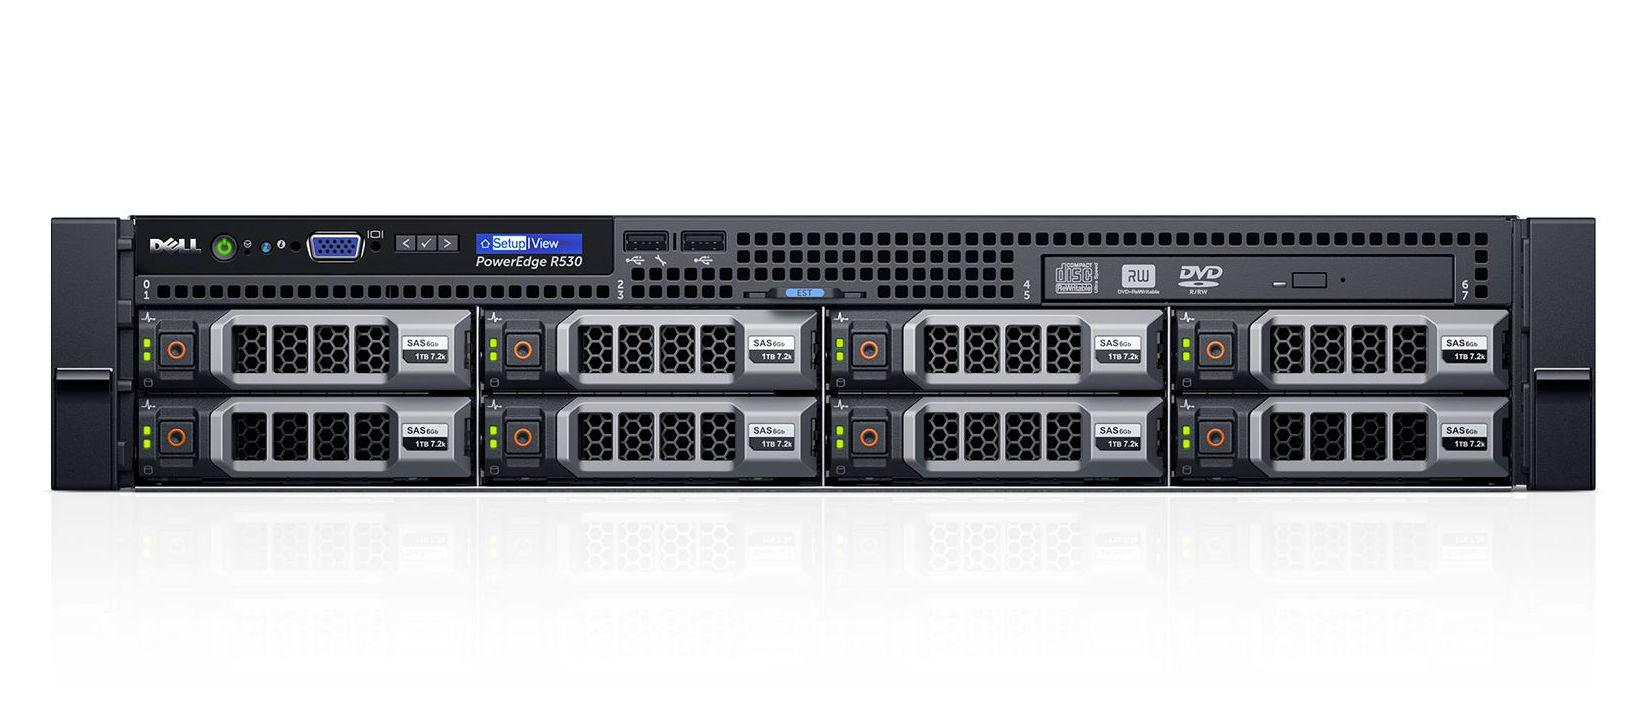 Máy chủ Server Dell R530 E5-2640 giá rẻ